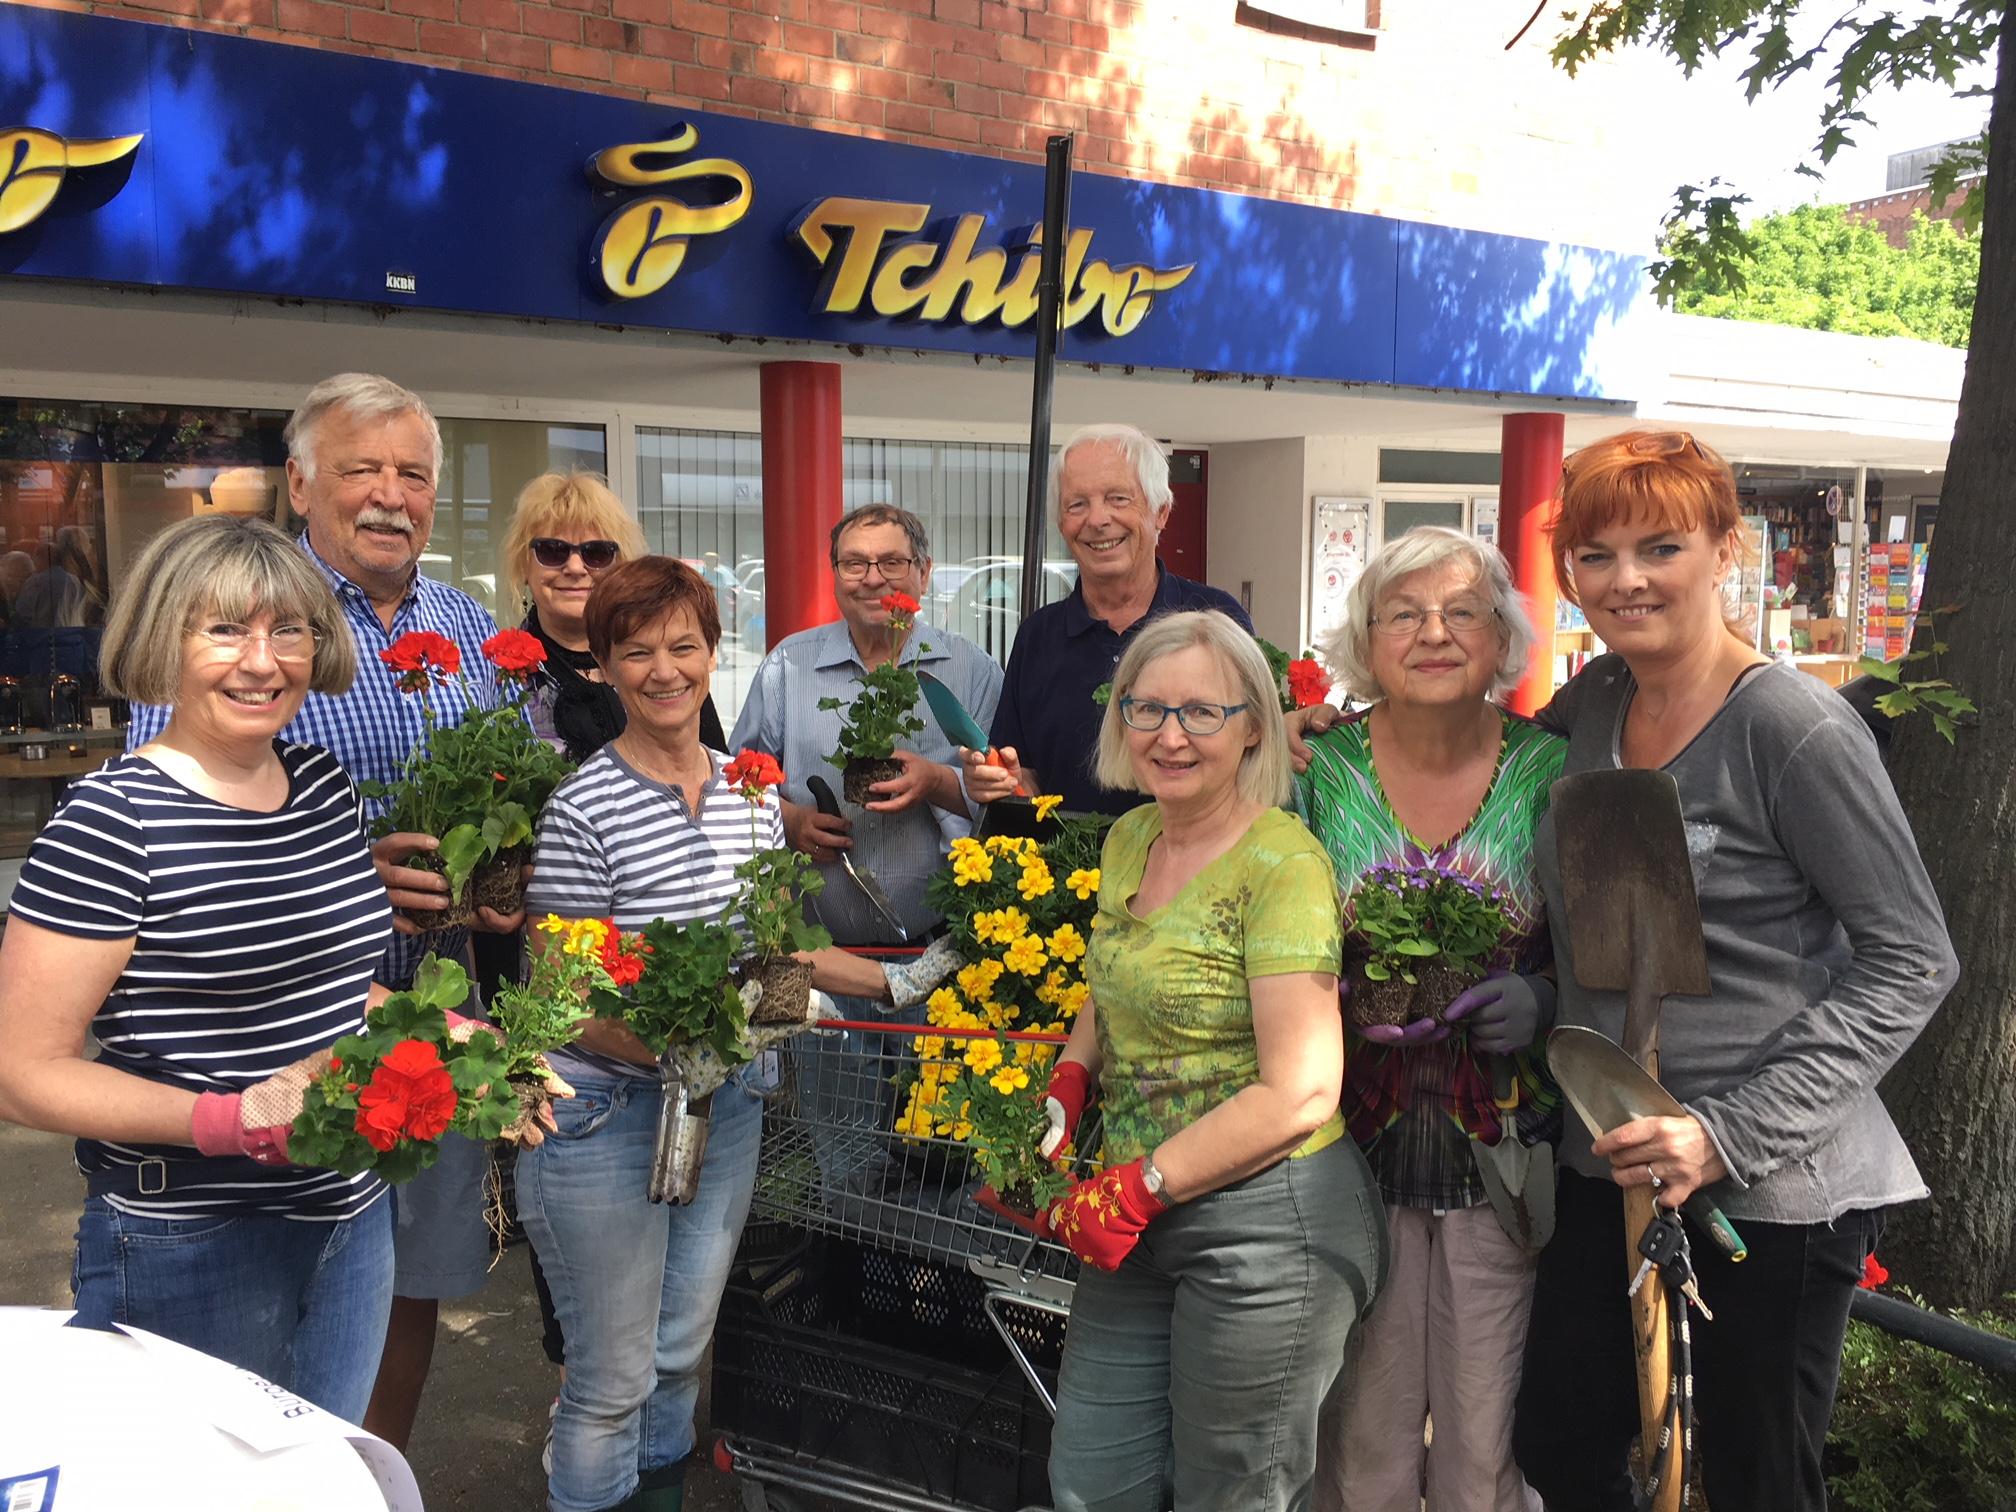 Bürger pflanzen bunte Beete in Rodenkirchen